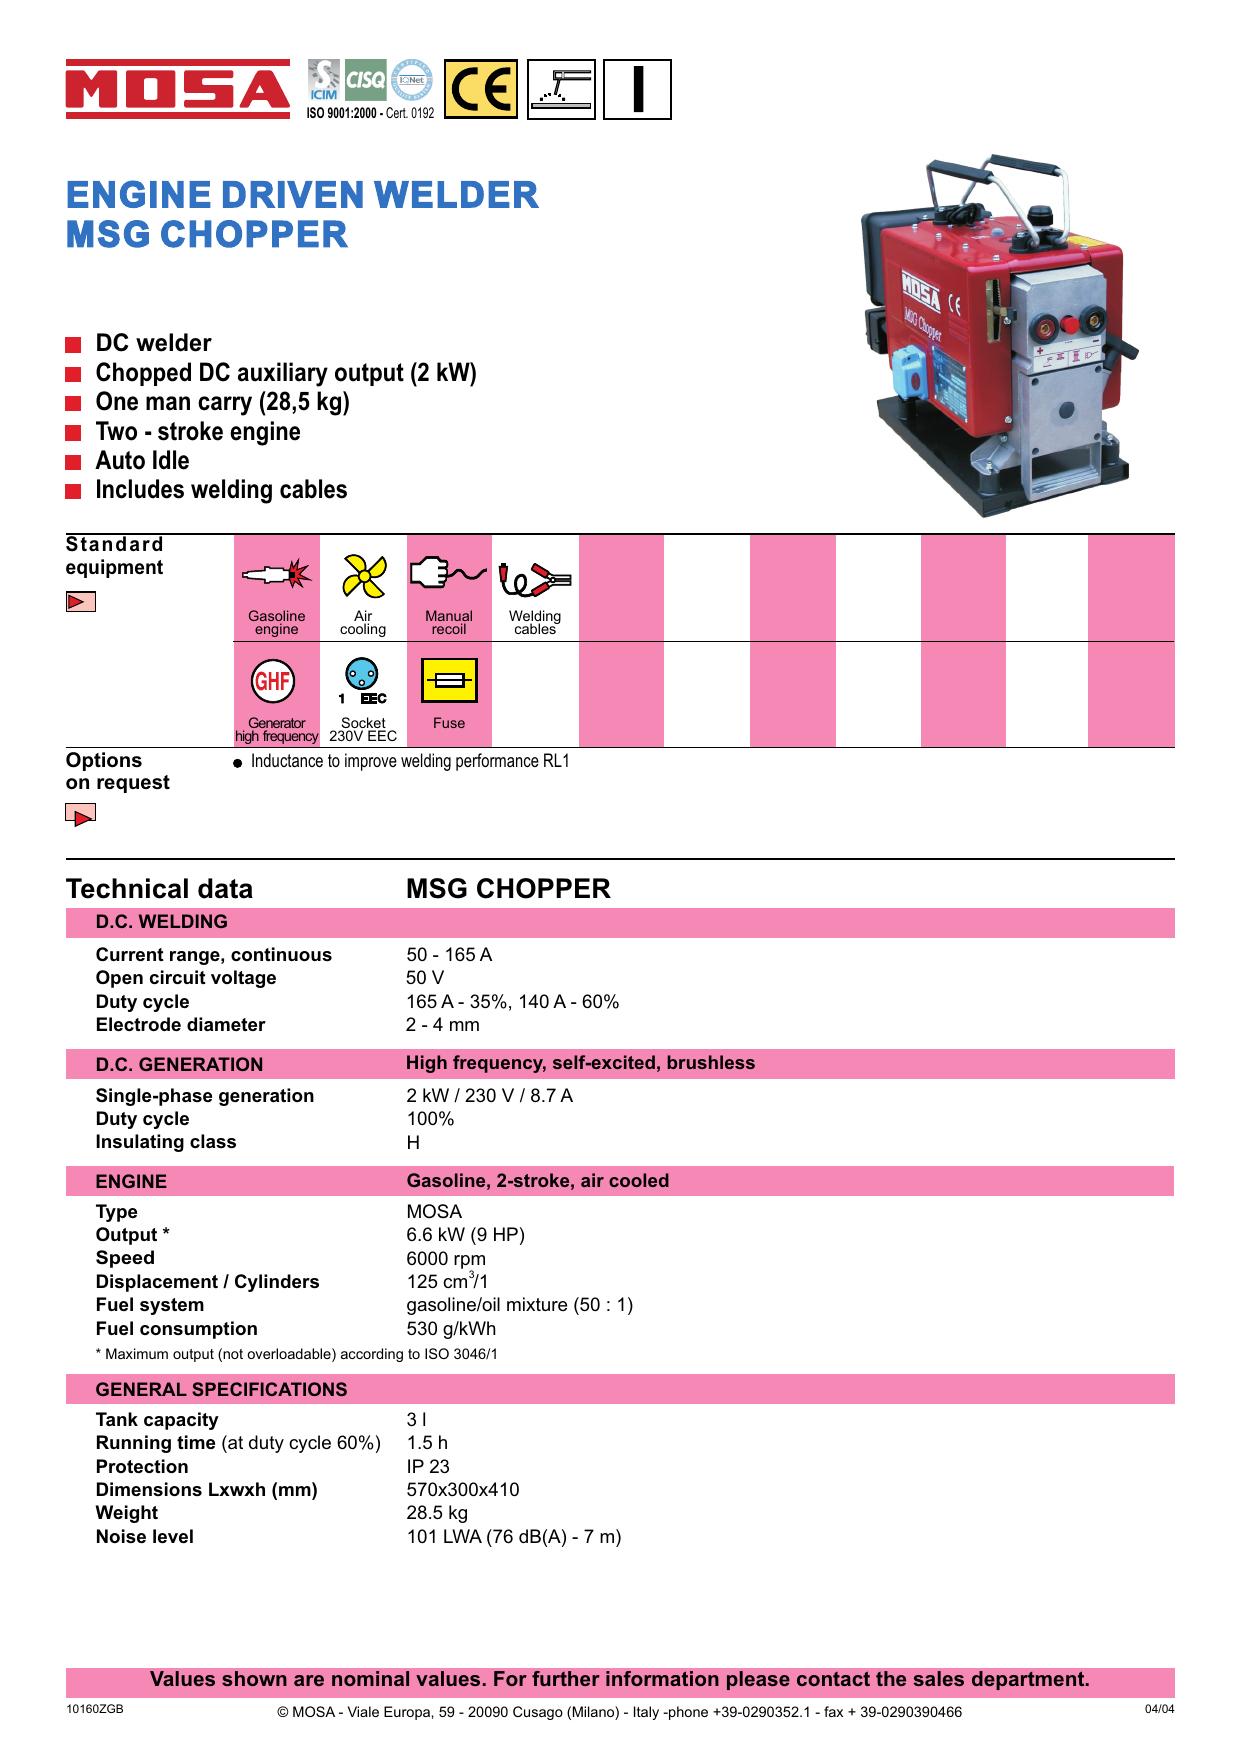 ENGINE DRIVEN WELDER MSG CHOPPER   manualzz com